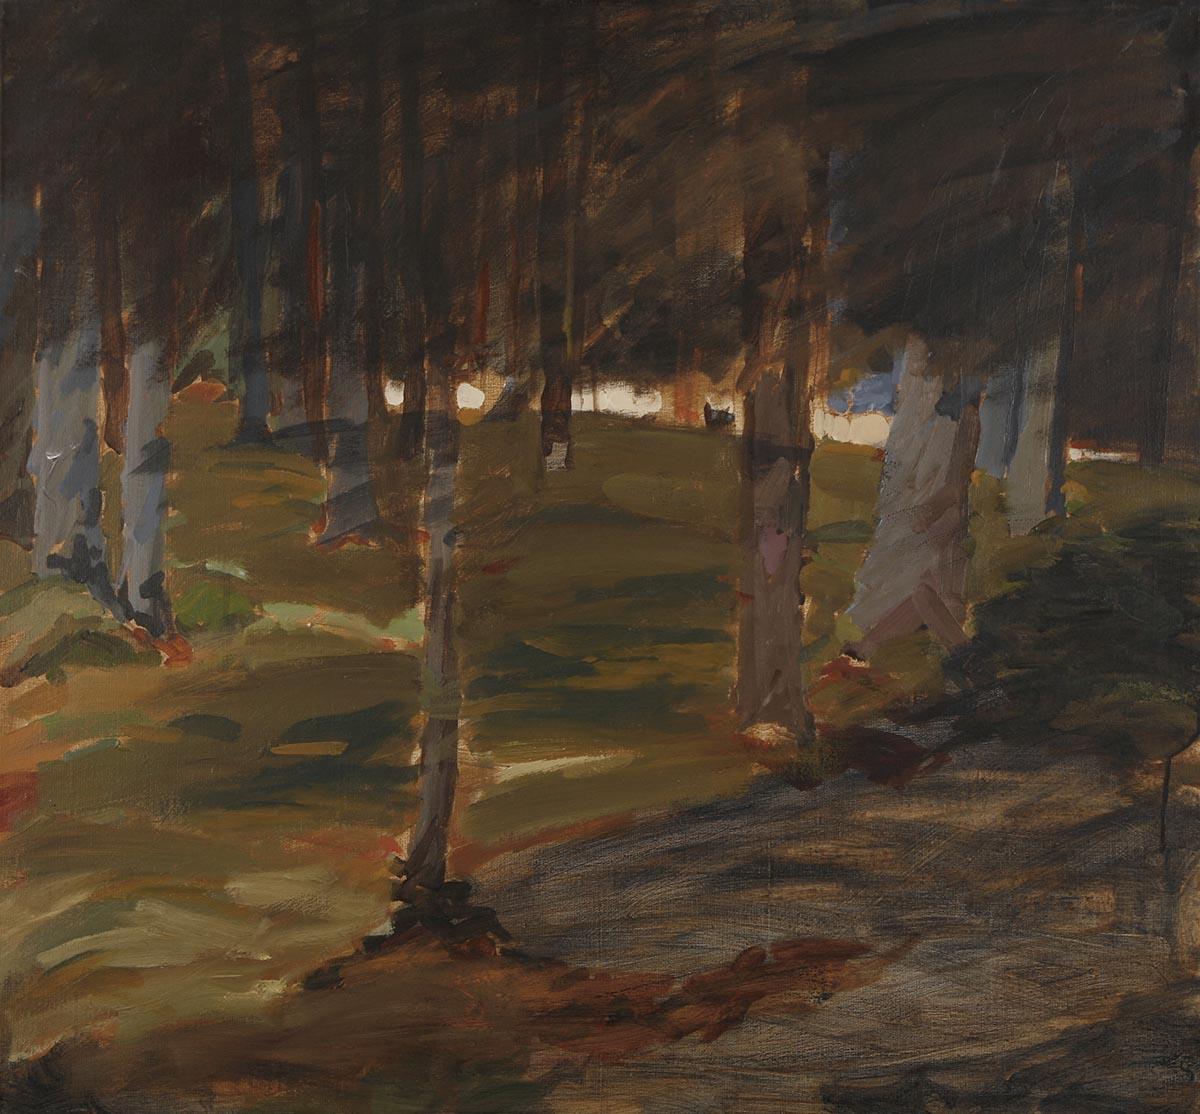 Sal, Akryl på duk, 89x96 cm, 2013